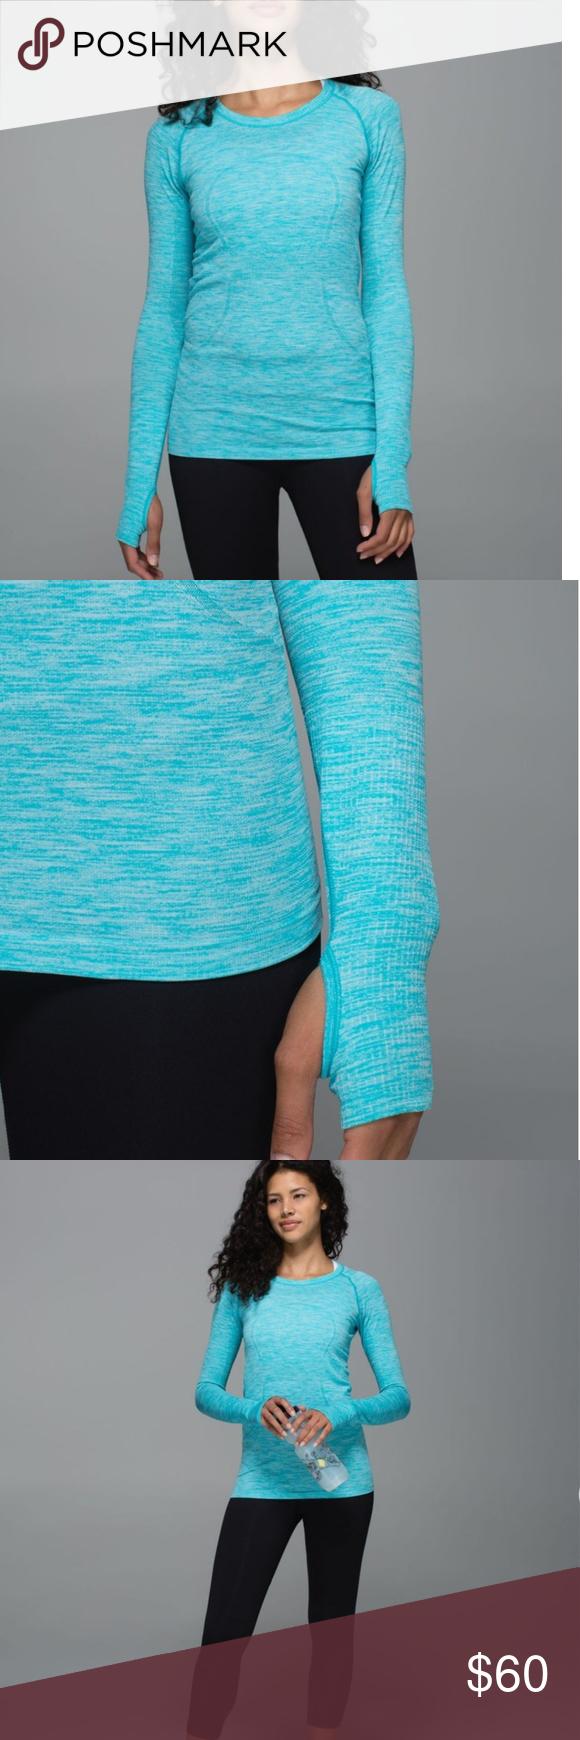 Lululemon Long Sleeve Great condition. lululemon athletica Tops #myposhpicks